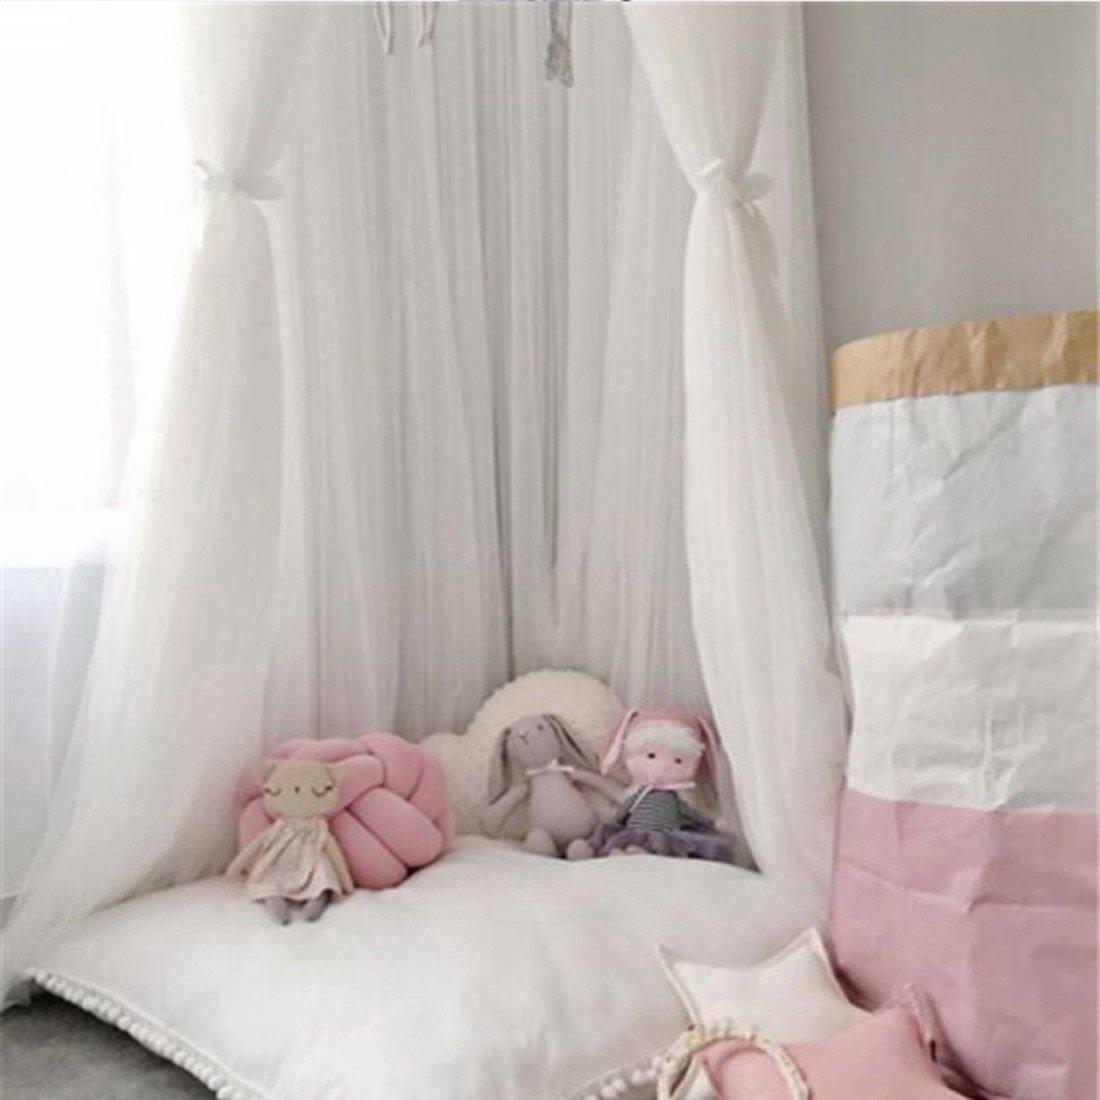 Freahap Betthimmel Baby Moskitonetz Insektenschutz Fur Kinder Babys Grau